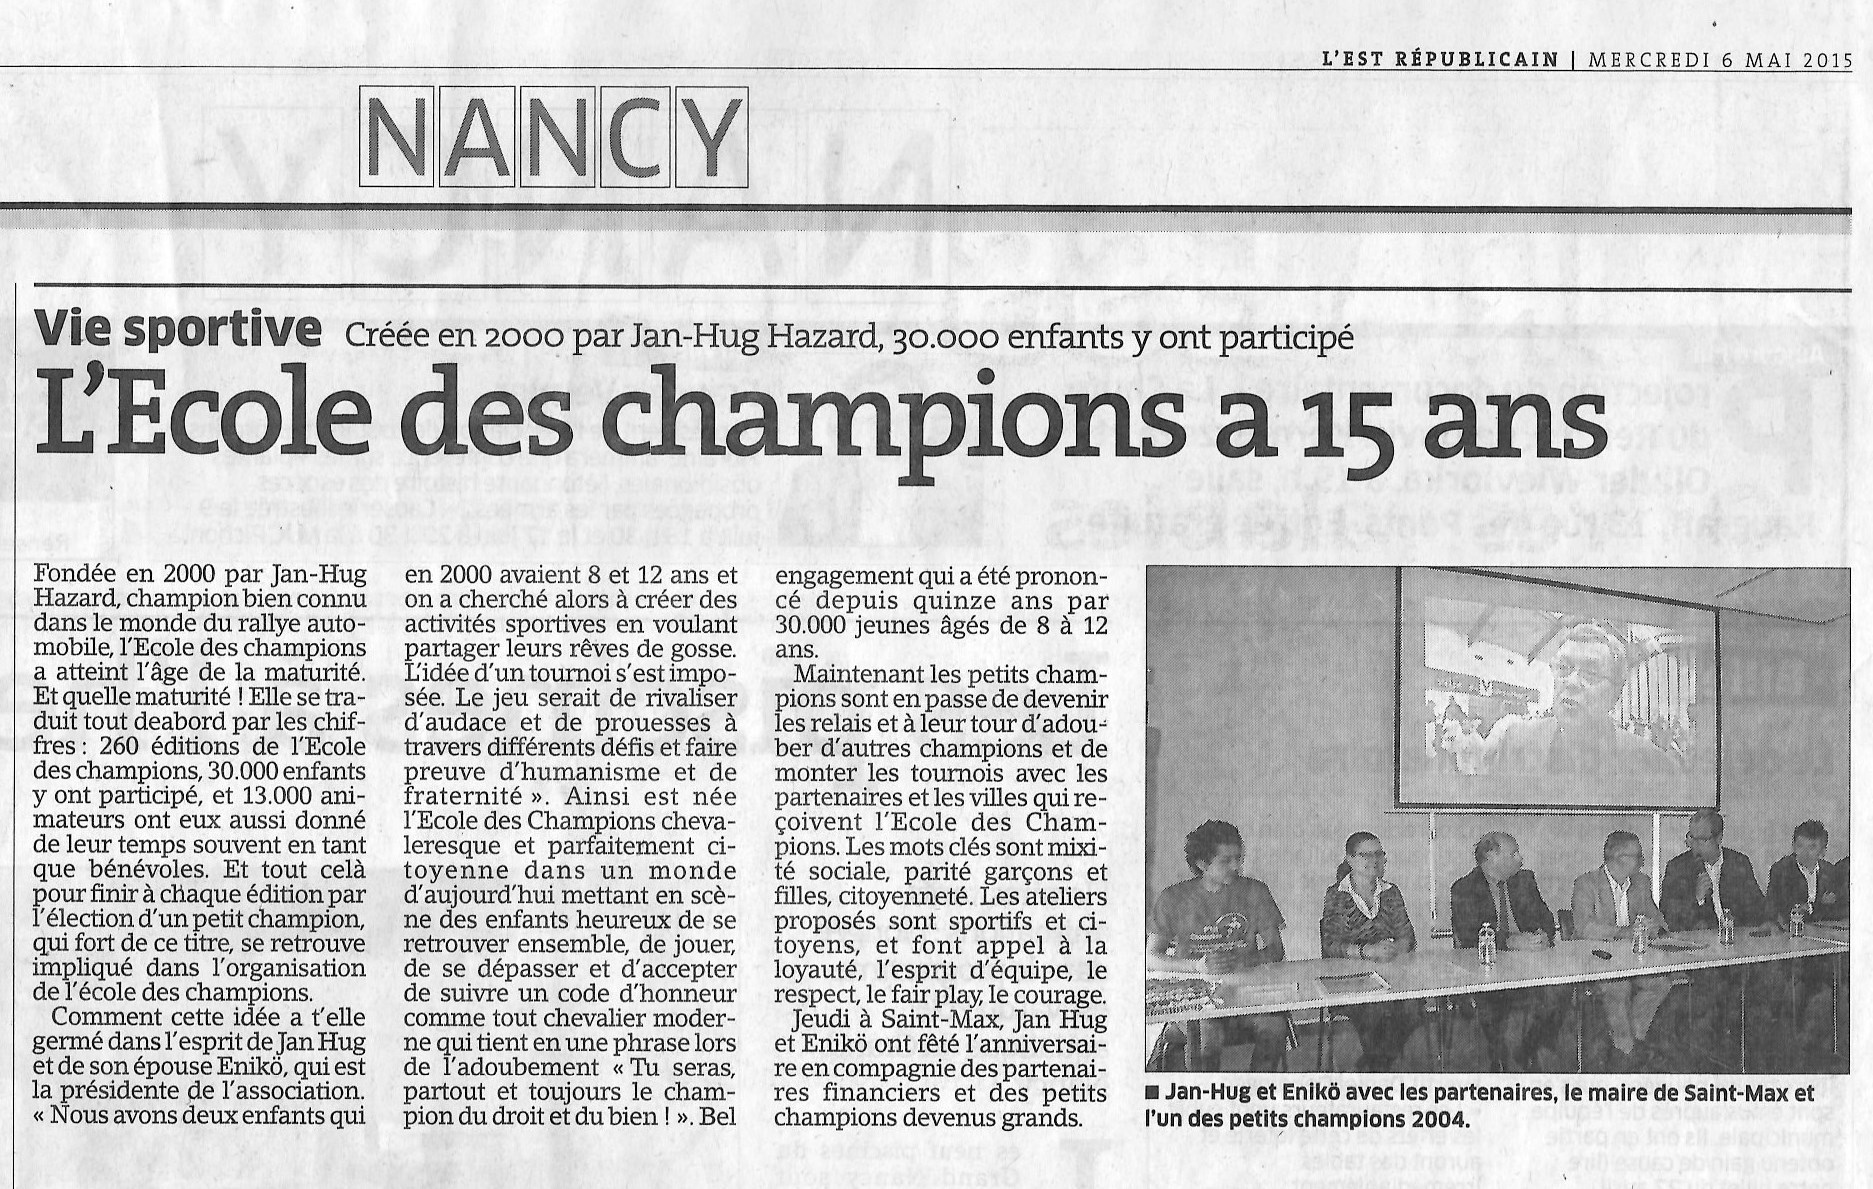 Conférence de presse 29 Avril 2015